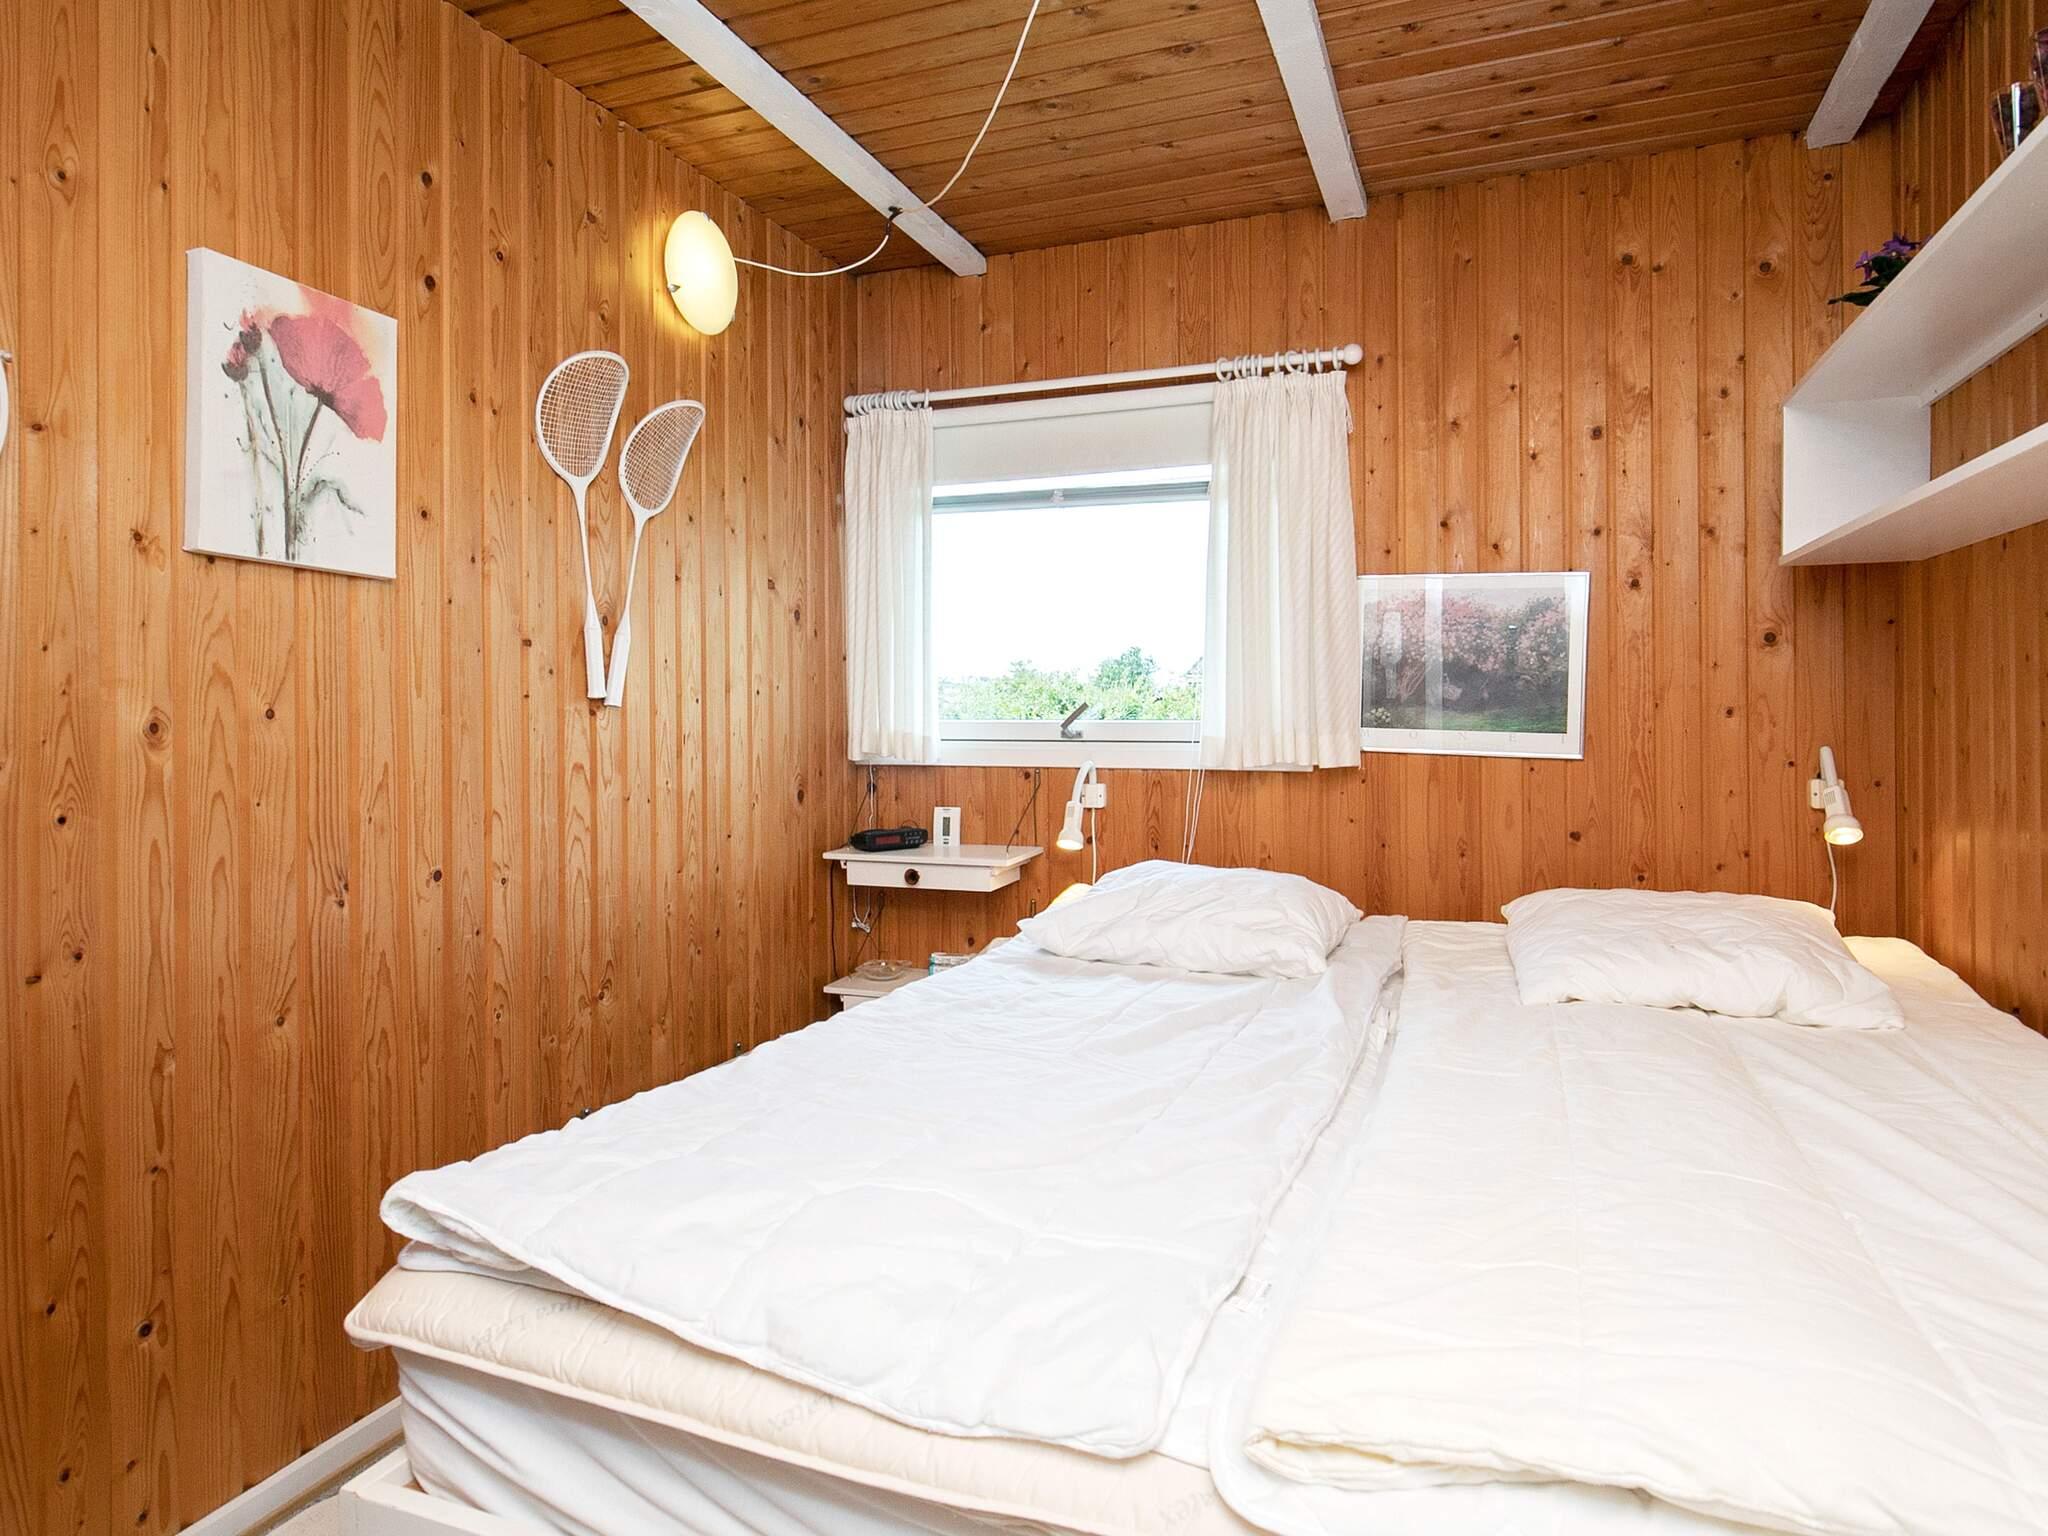 Maison de vacances Eskov Strandpark (610274), Roslev, , Limfjord, Danemark, image 12